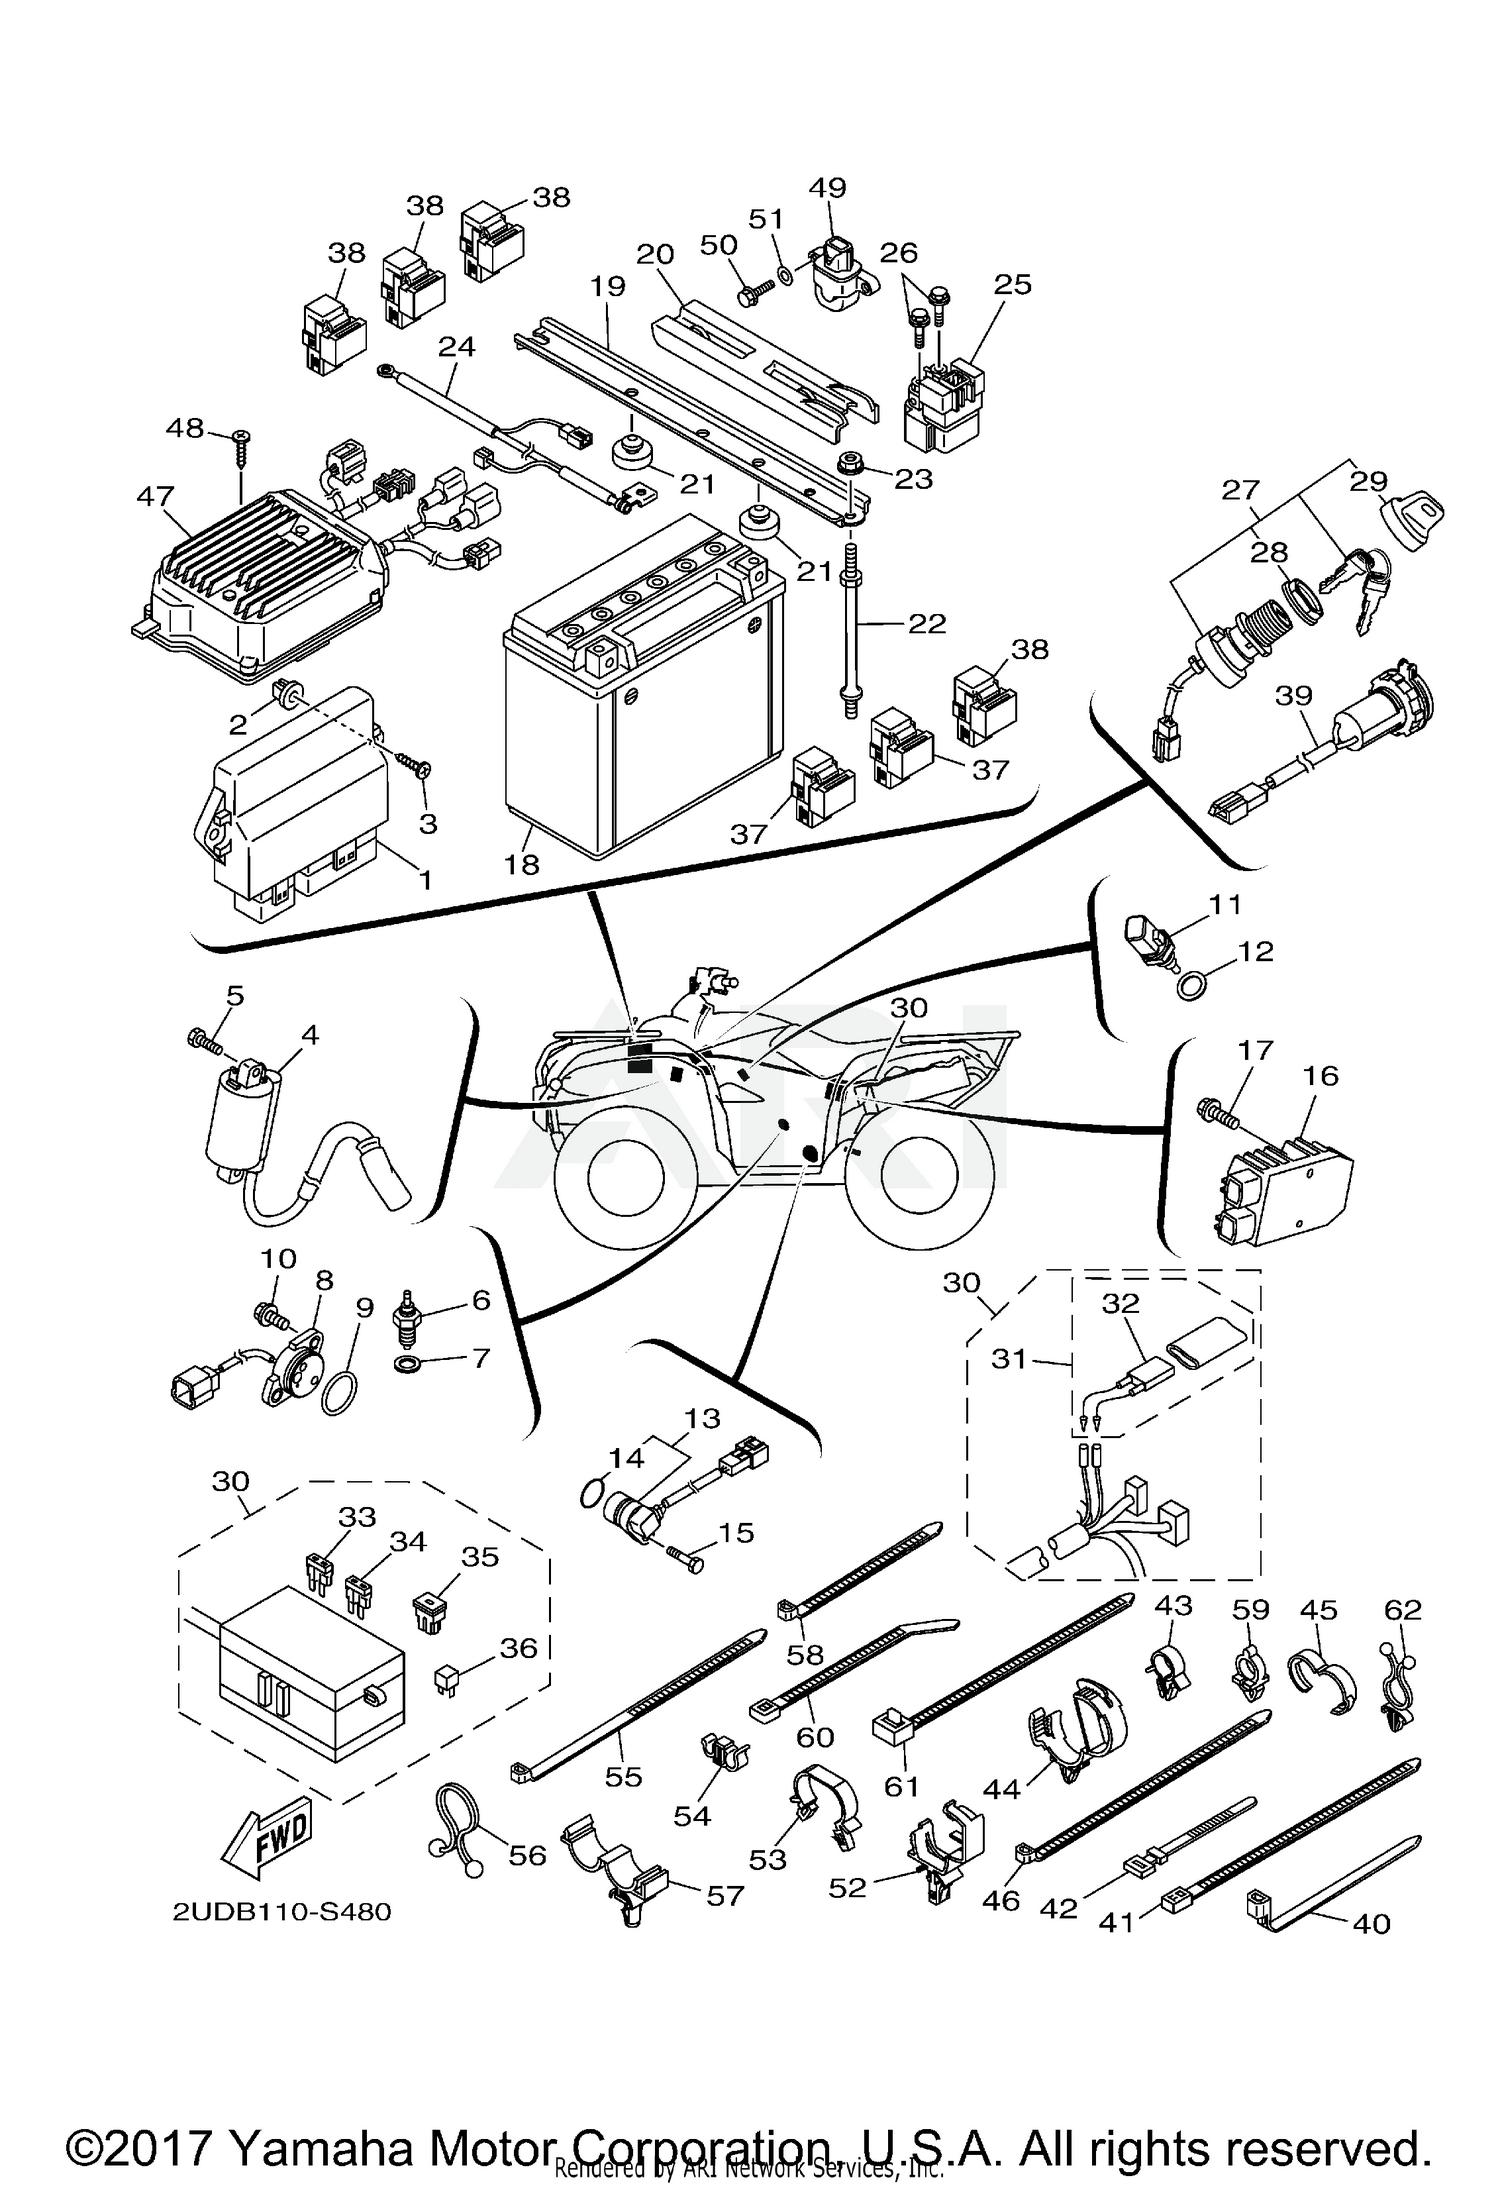 2017 Yamaha Grizzly 700 Wiring Diagram - Wiring Diagram